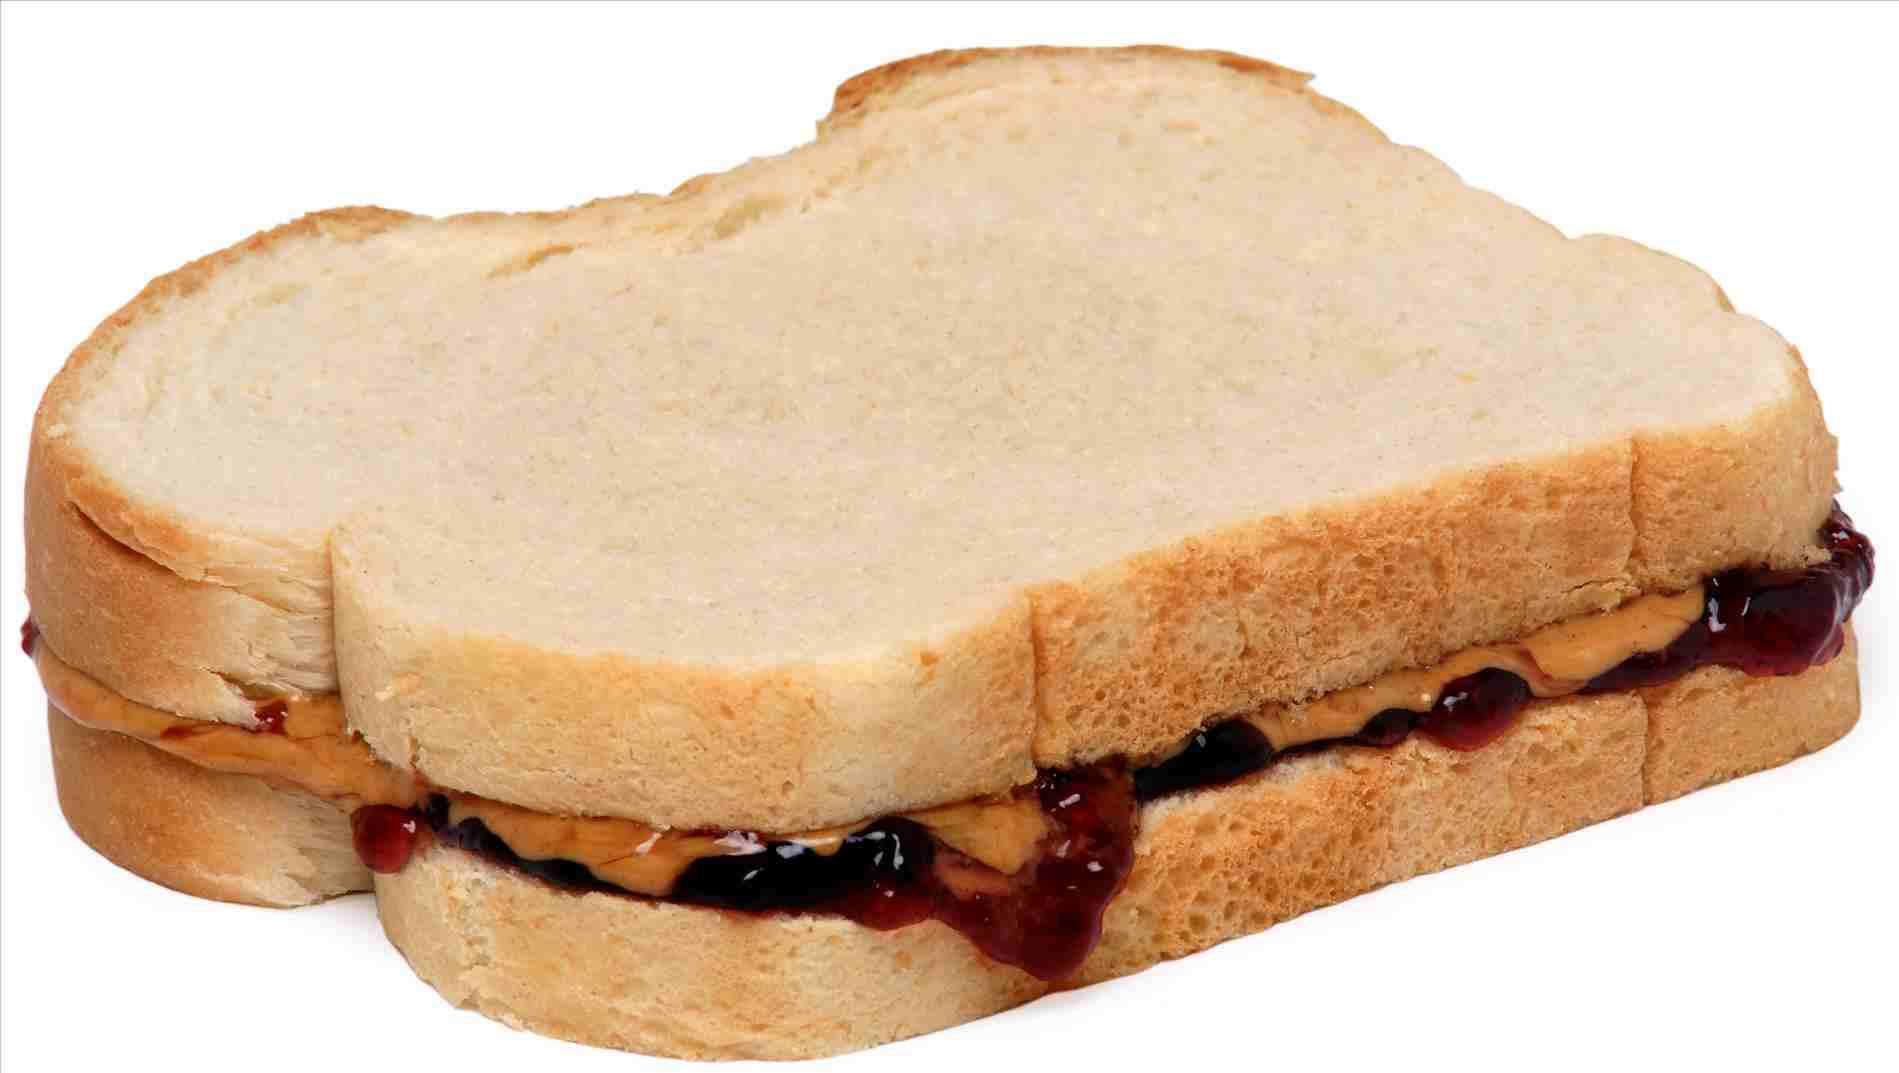 Rhpinterestcom home Peanut Butter And Jelly Sandwich Clipart.